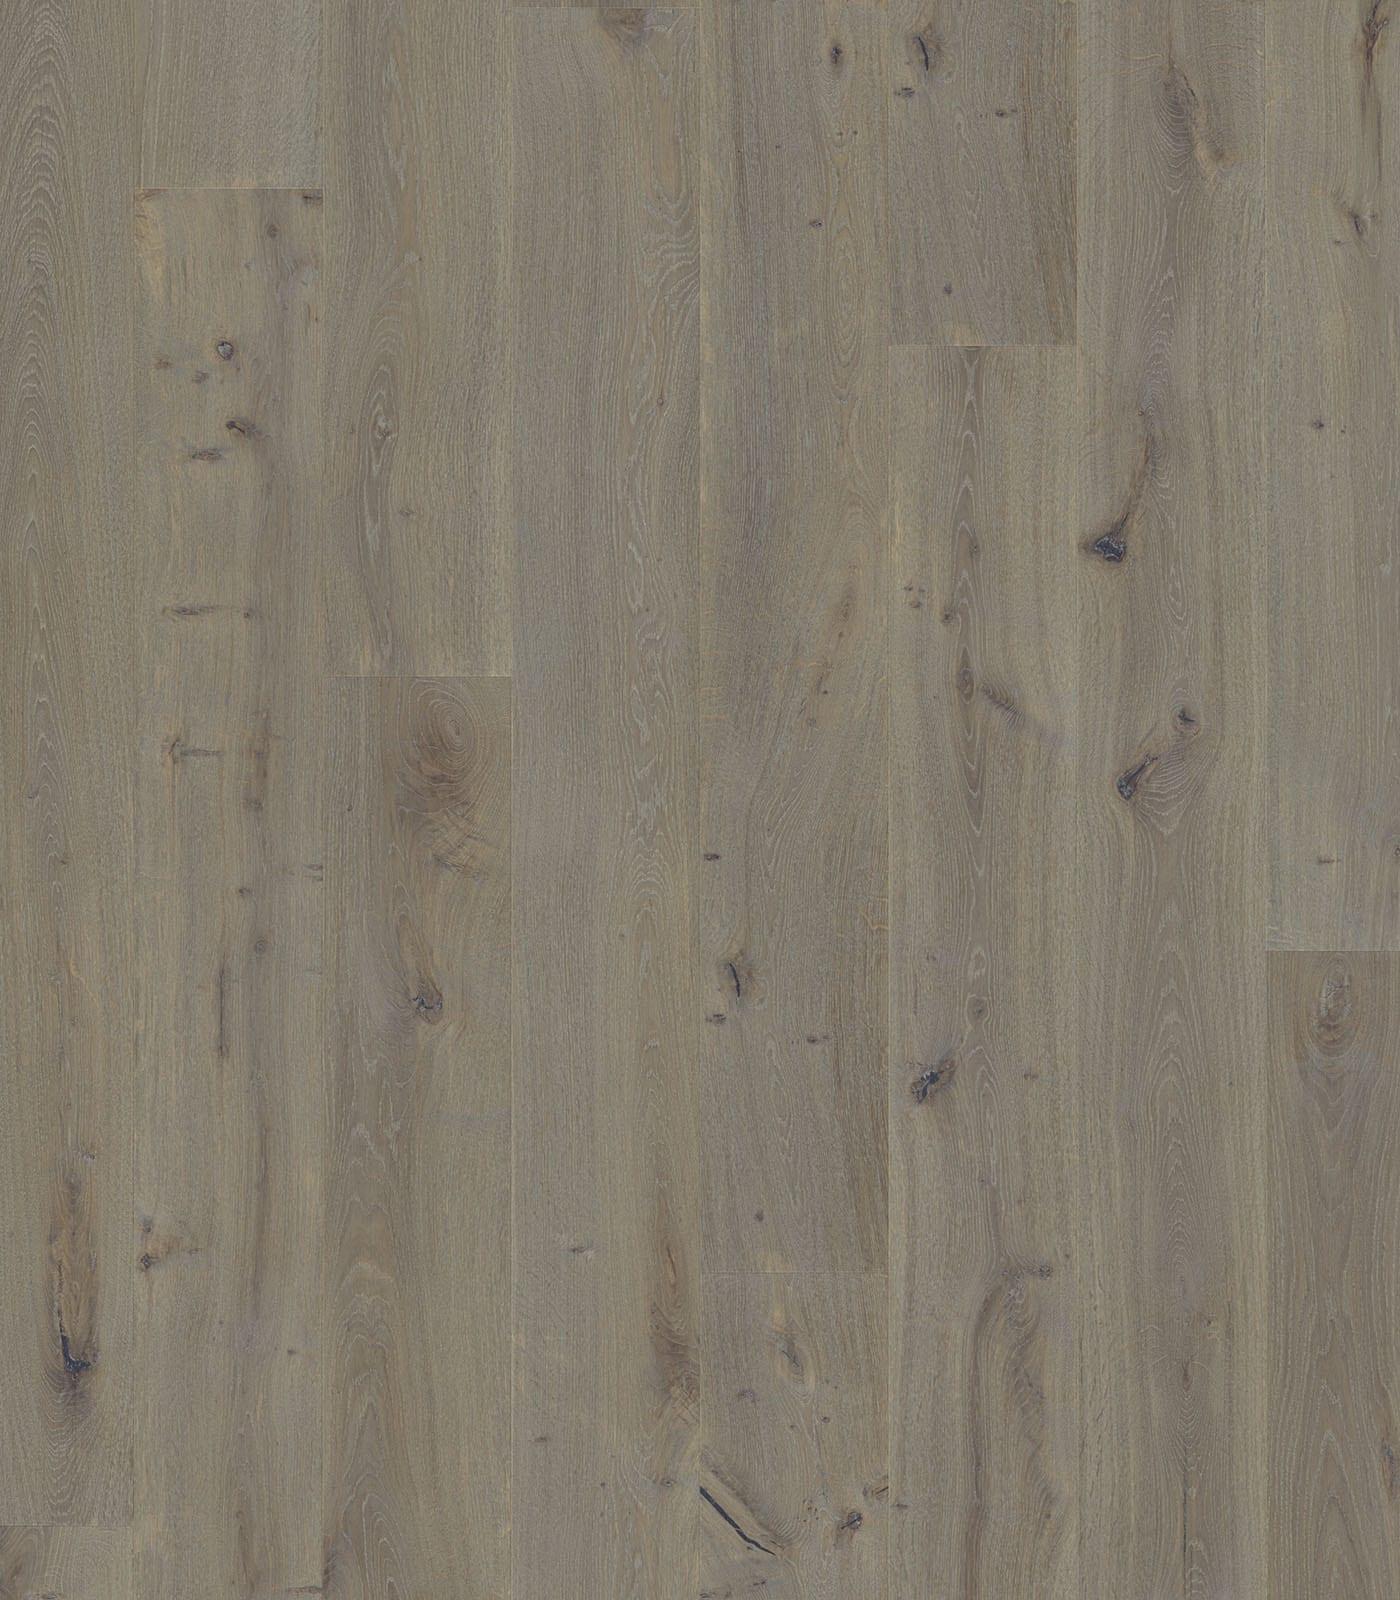 Whitsundays-European Oak floors-Lifestyle collection-flat